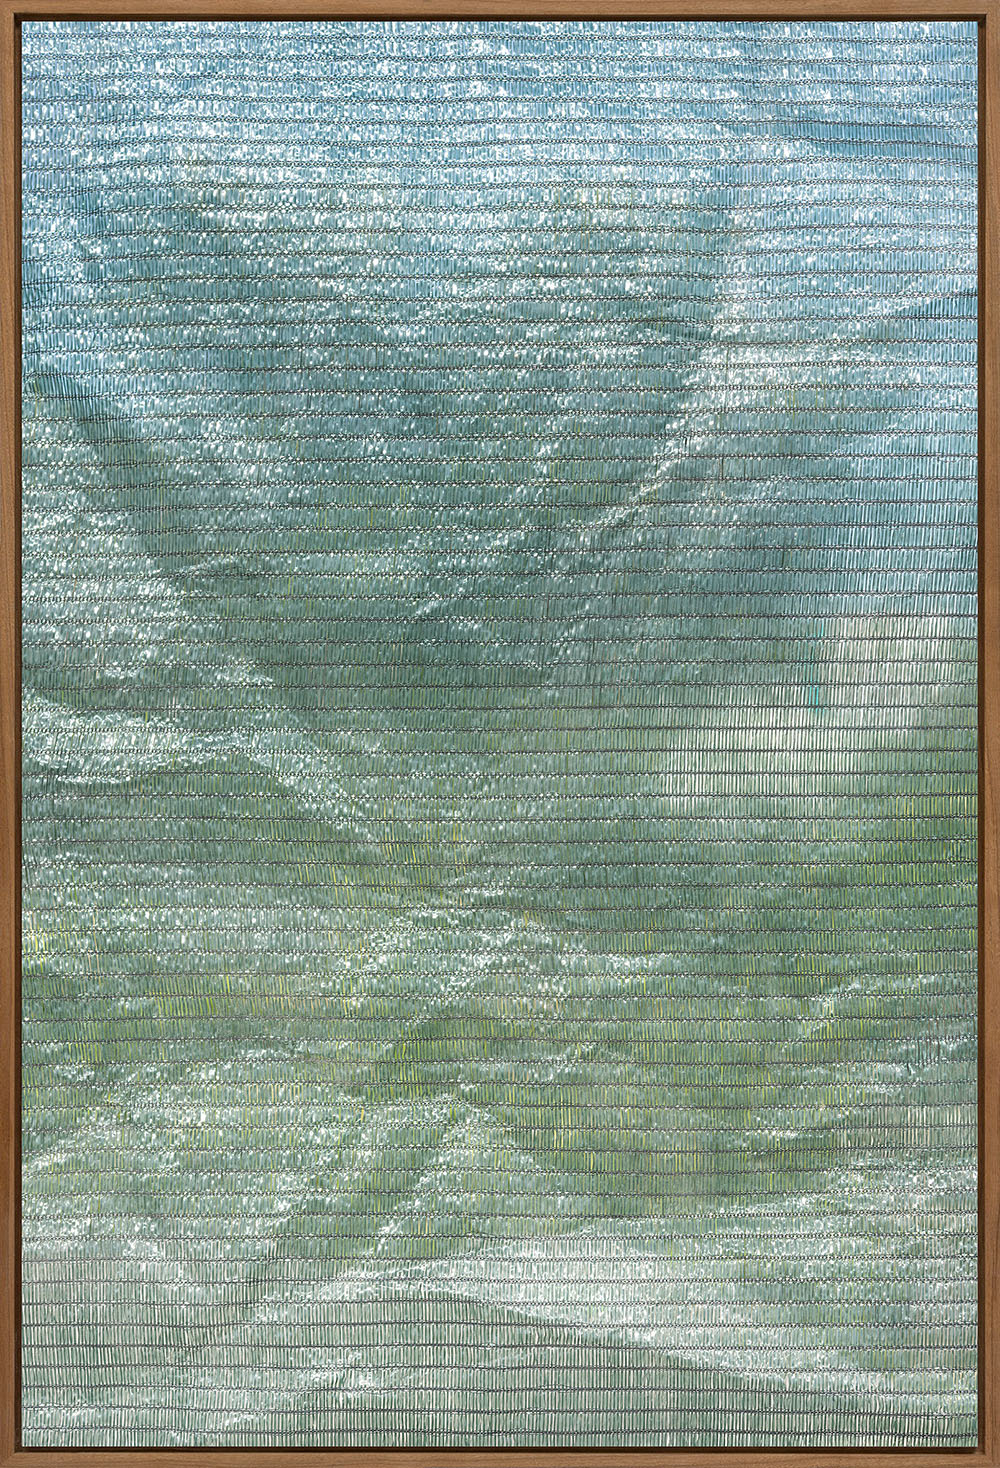 Berit Schneidereit draperie V mit Rahmen, Tintenstrahldruck, 48x33cm, 5+2AP, 2017